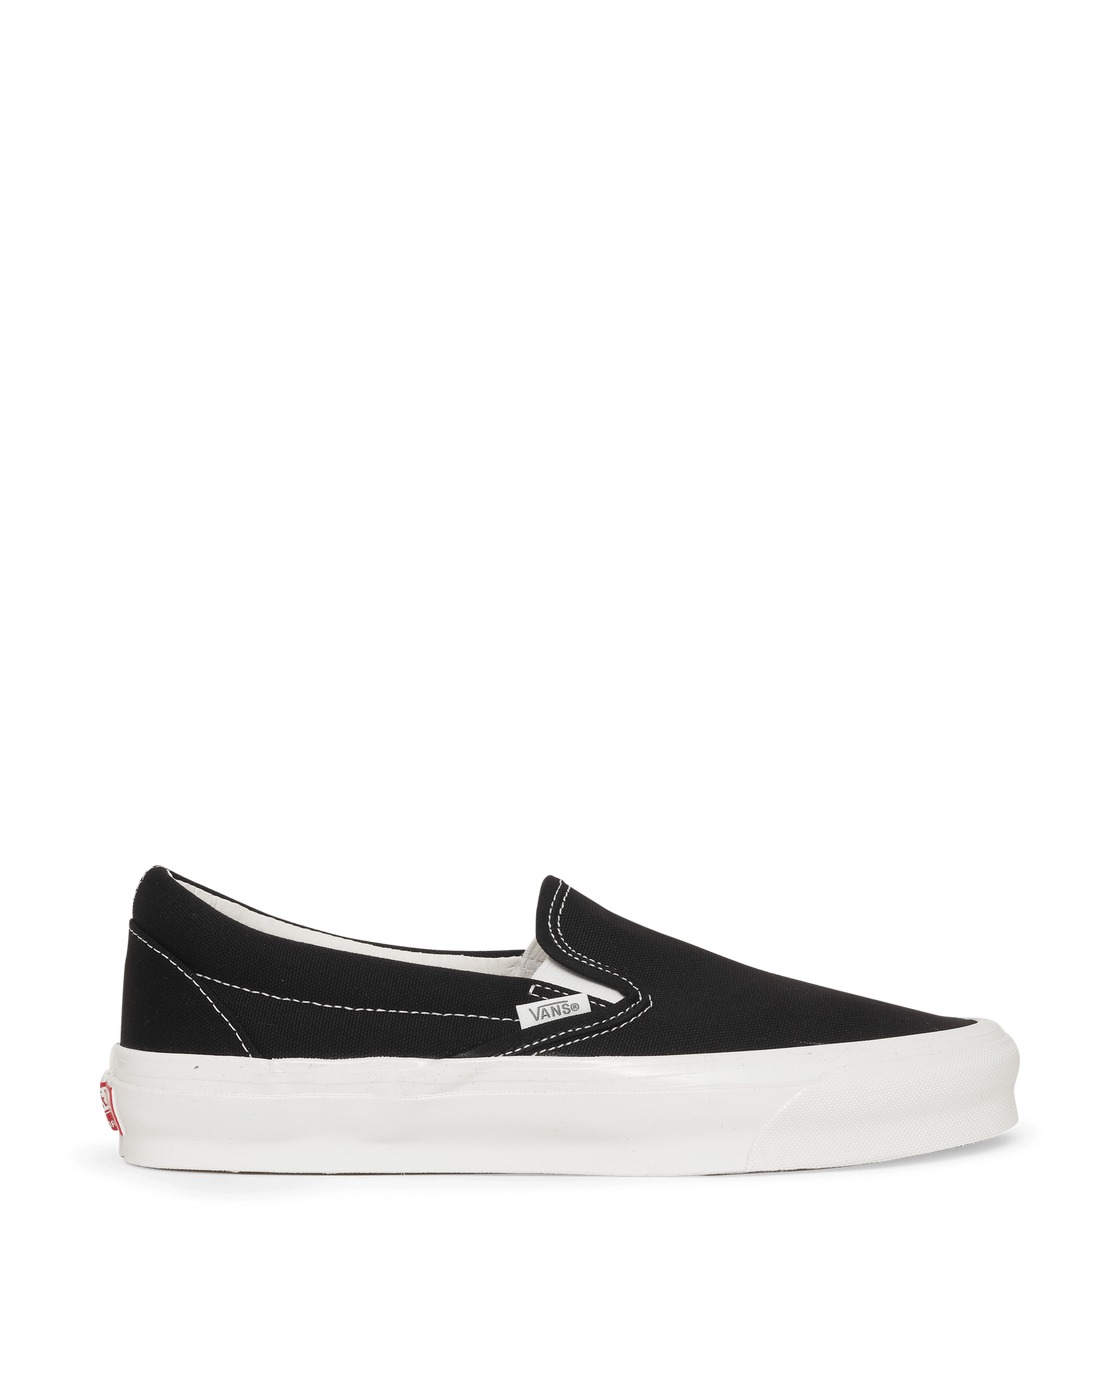 Photo: Vans Classic Slip On Sneakers Black/True White